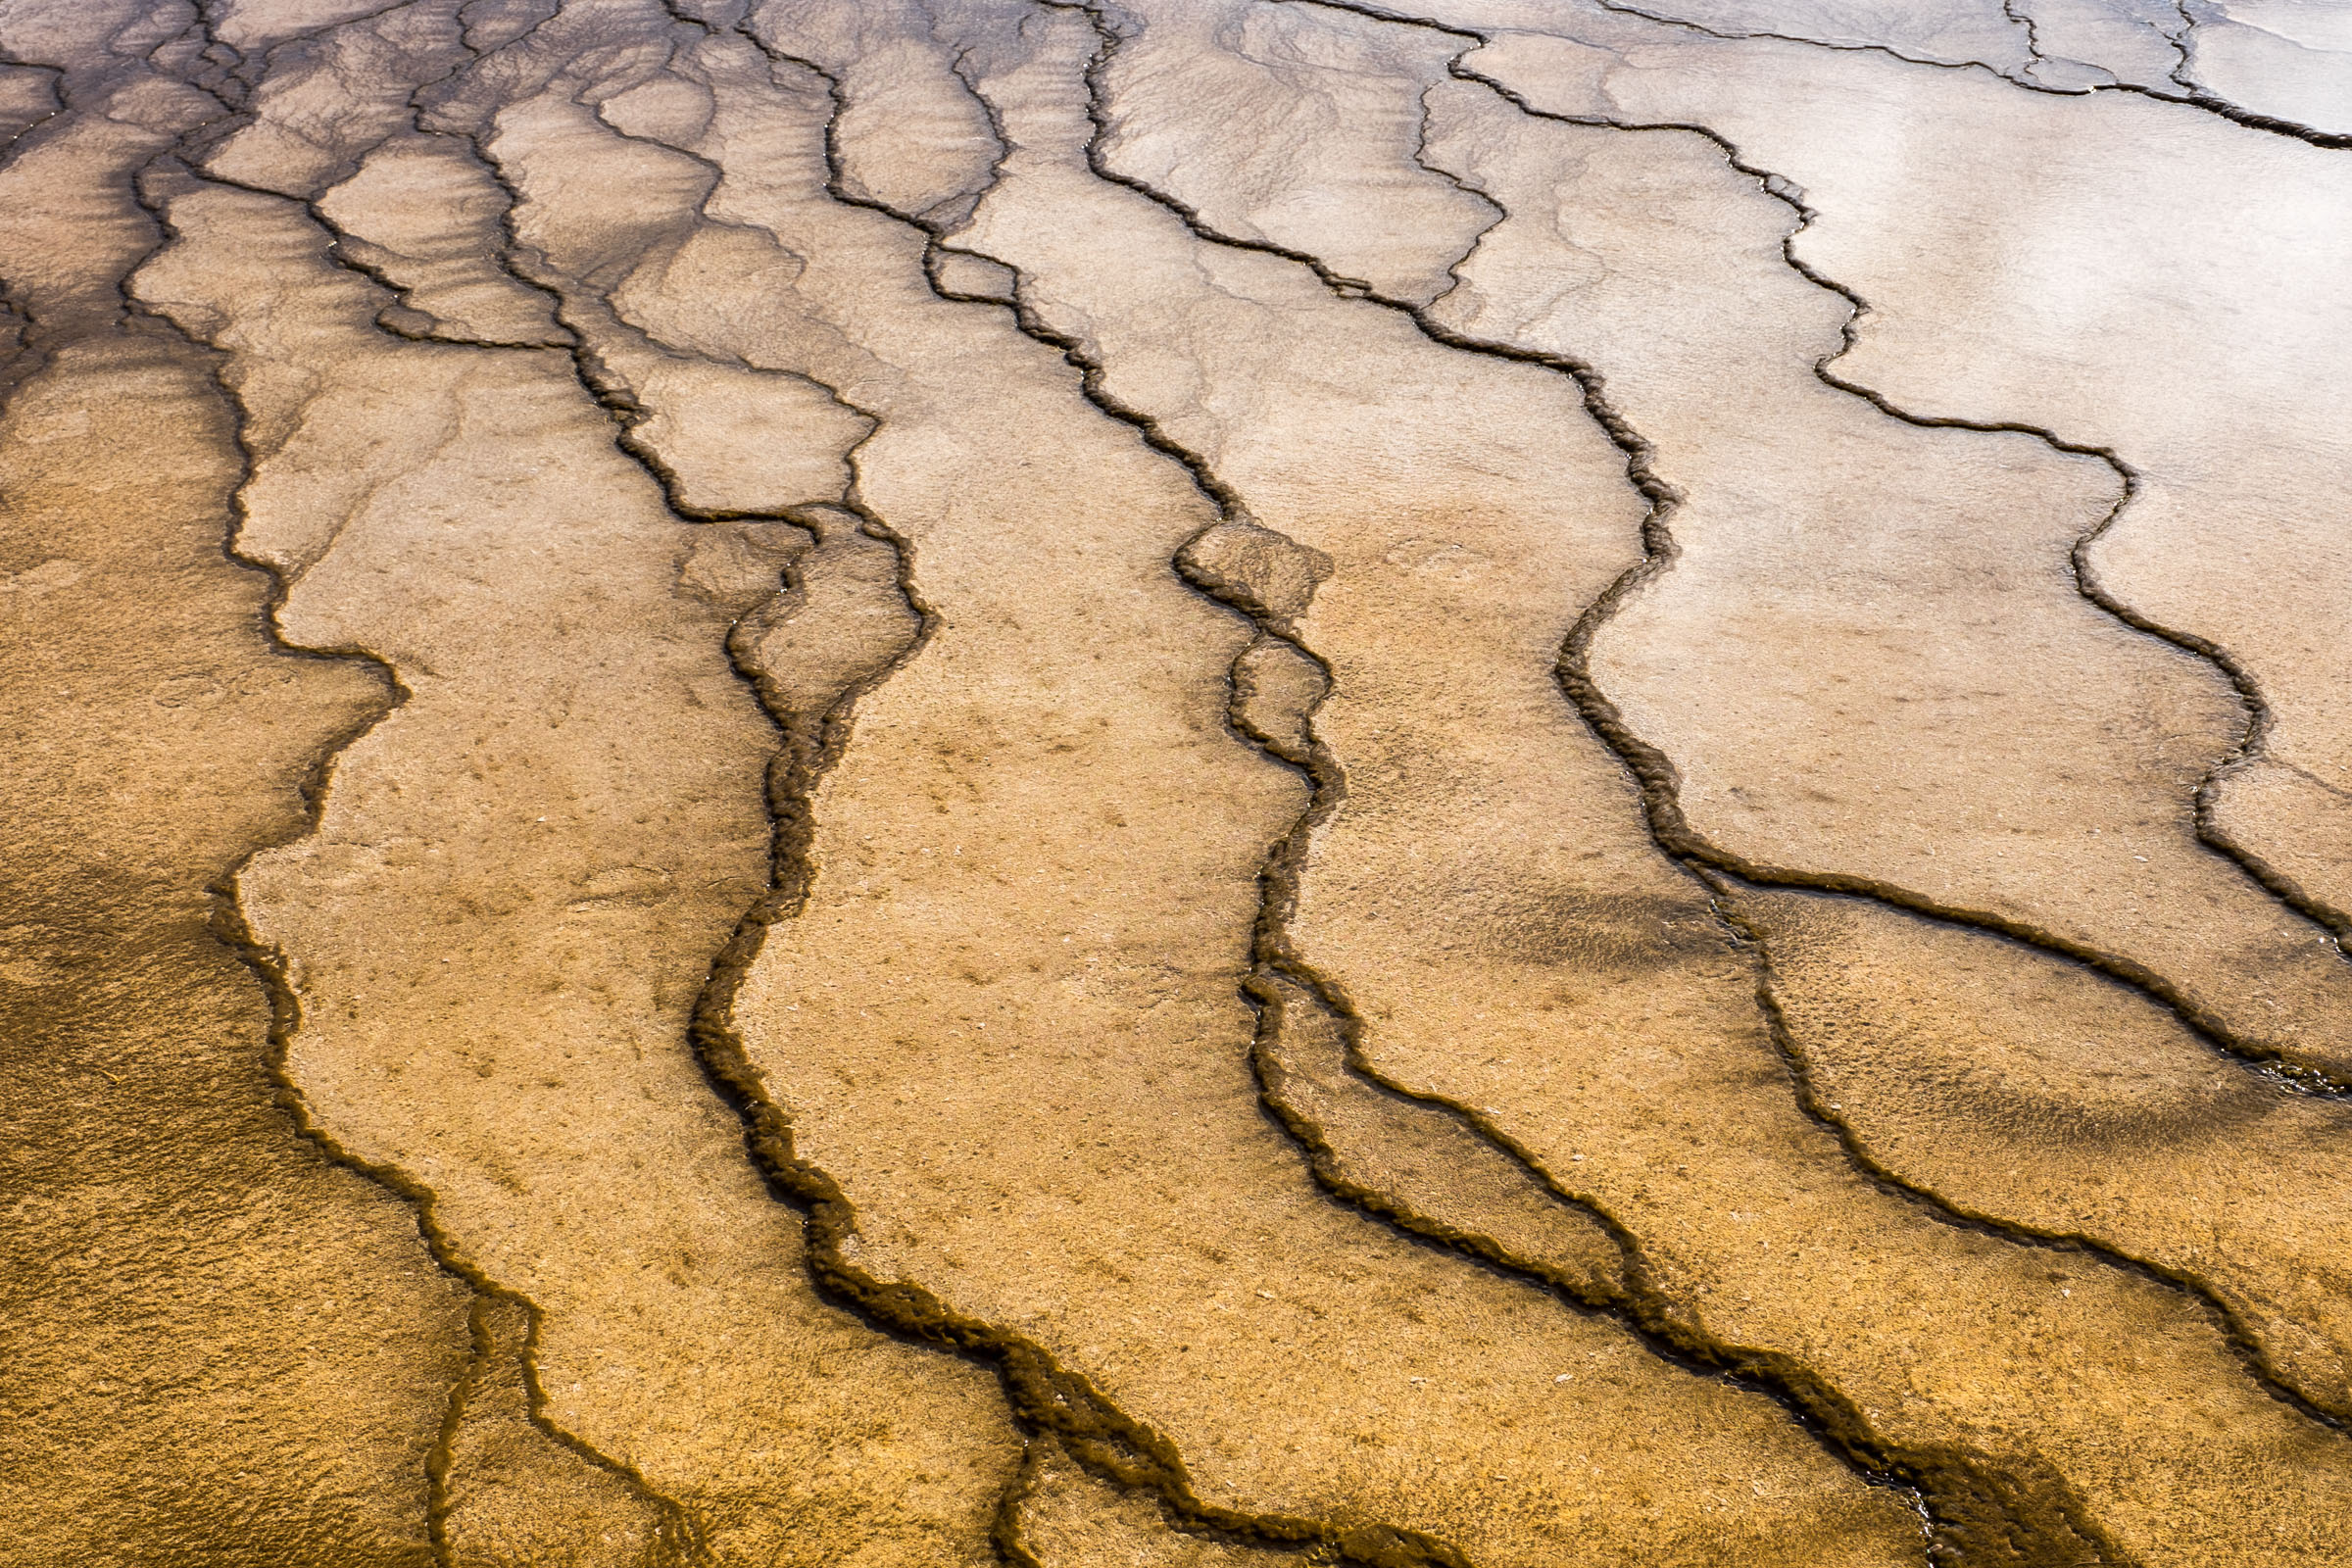 20160920-JI-Yellowstone National Park-_DSF0478.jpg